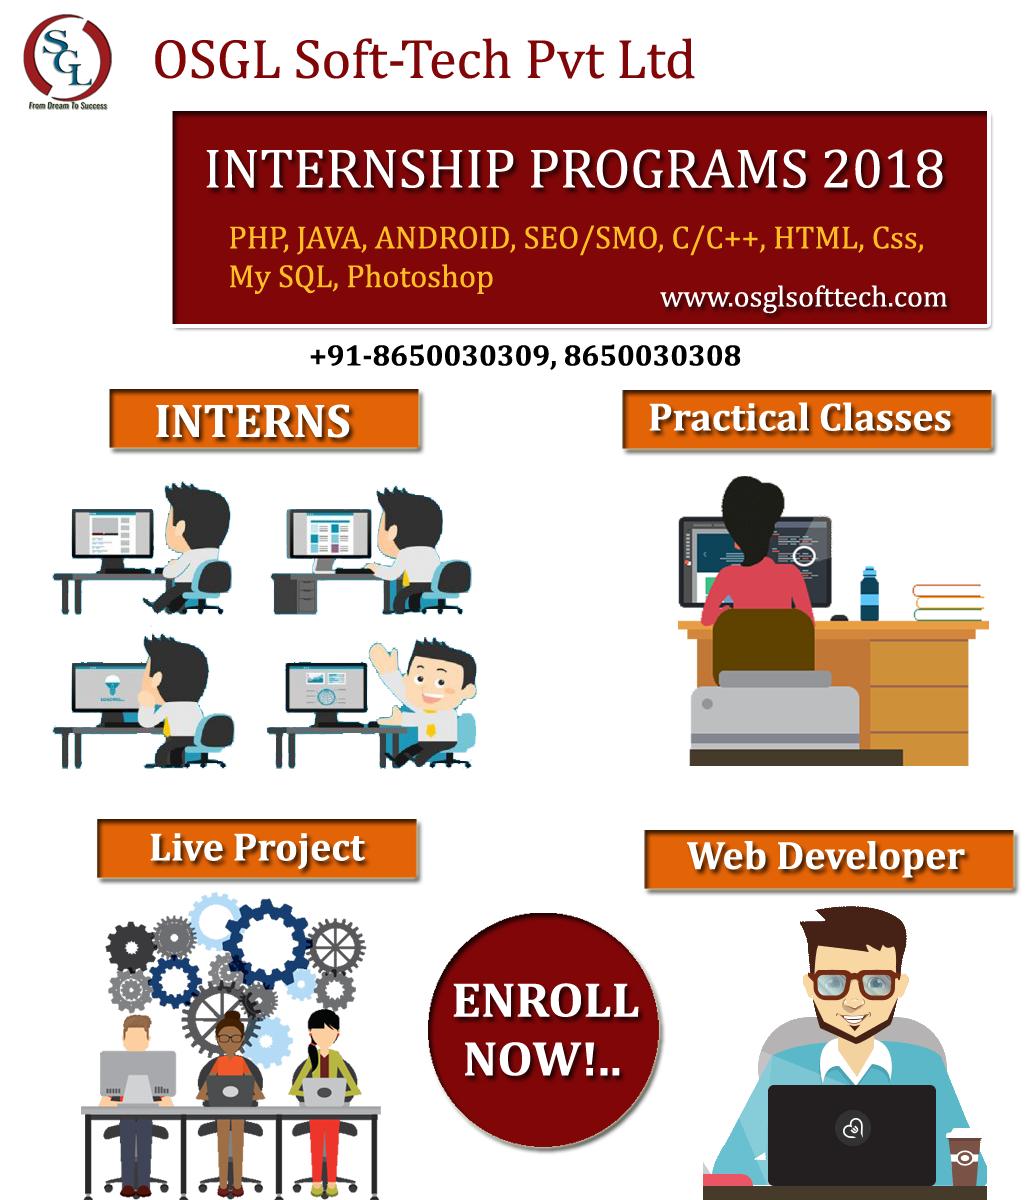 apply for internships 2018 in dehradun osgl soft